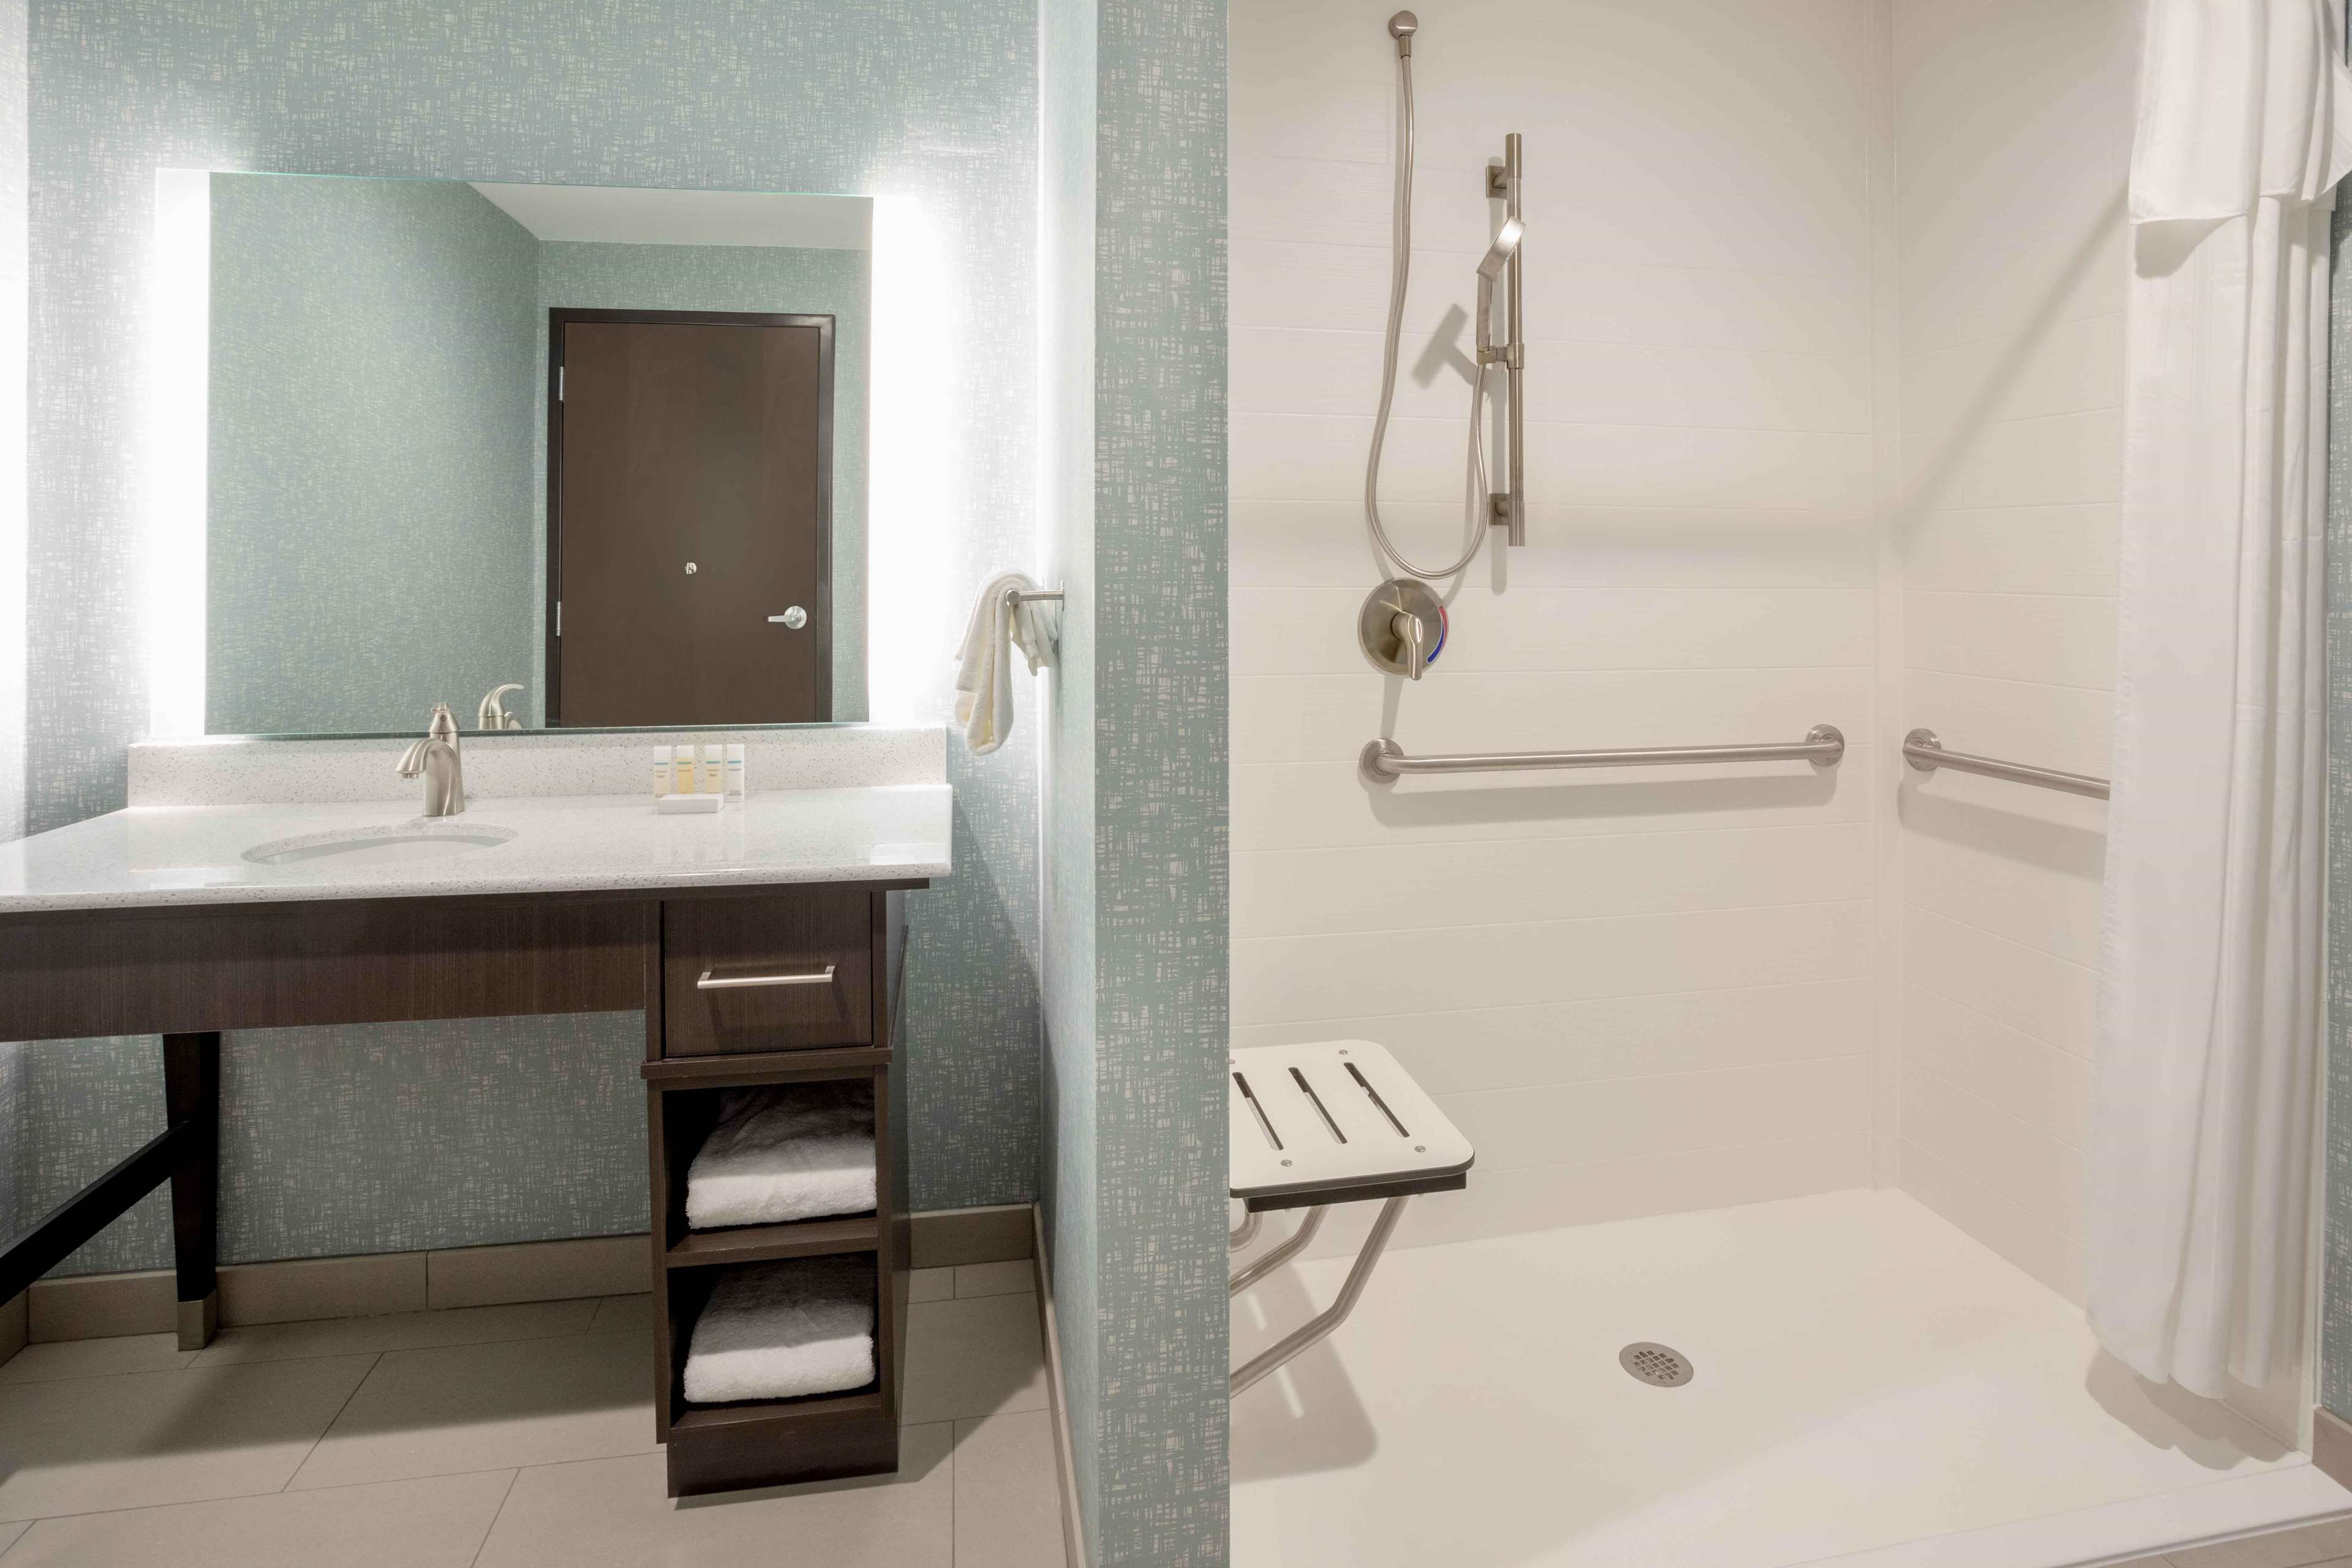 Homewood Suites by Hilton Edina Minneapolis image 25